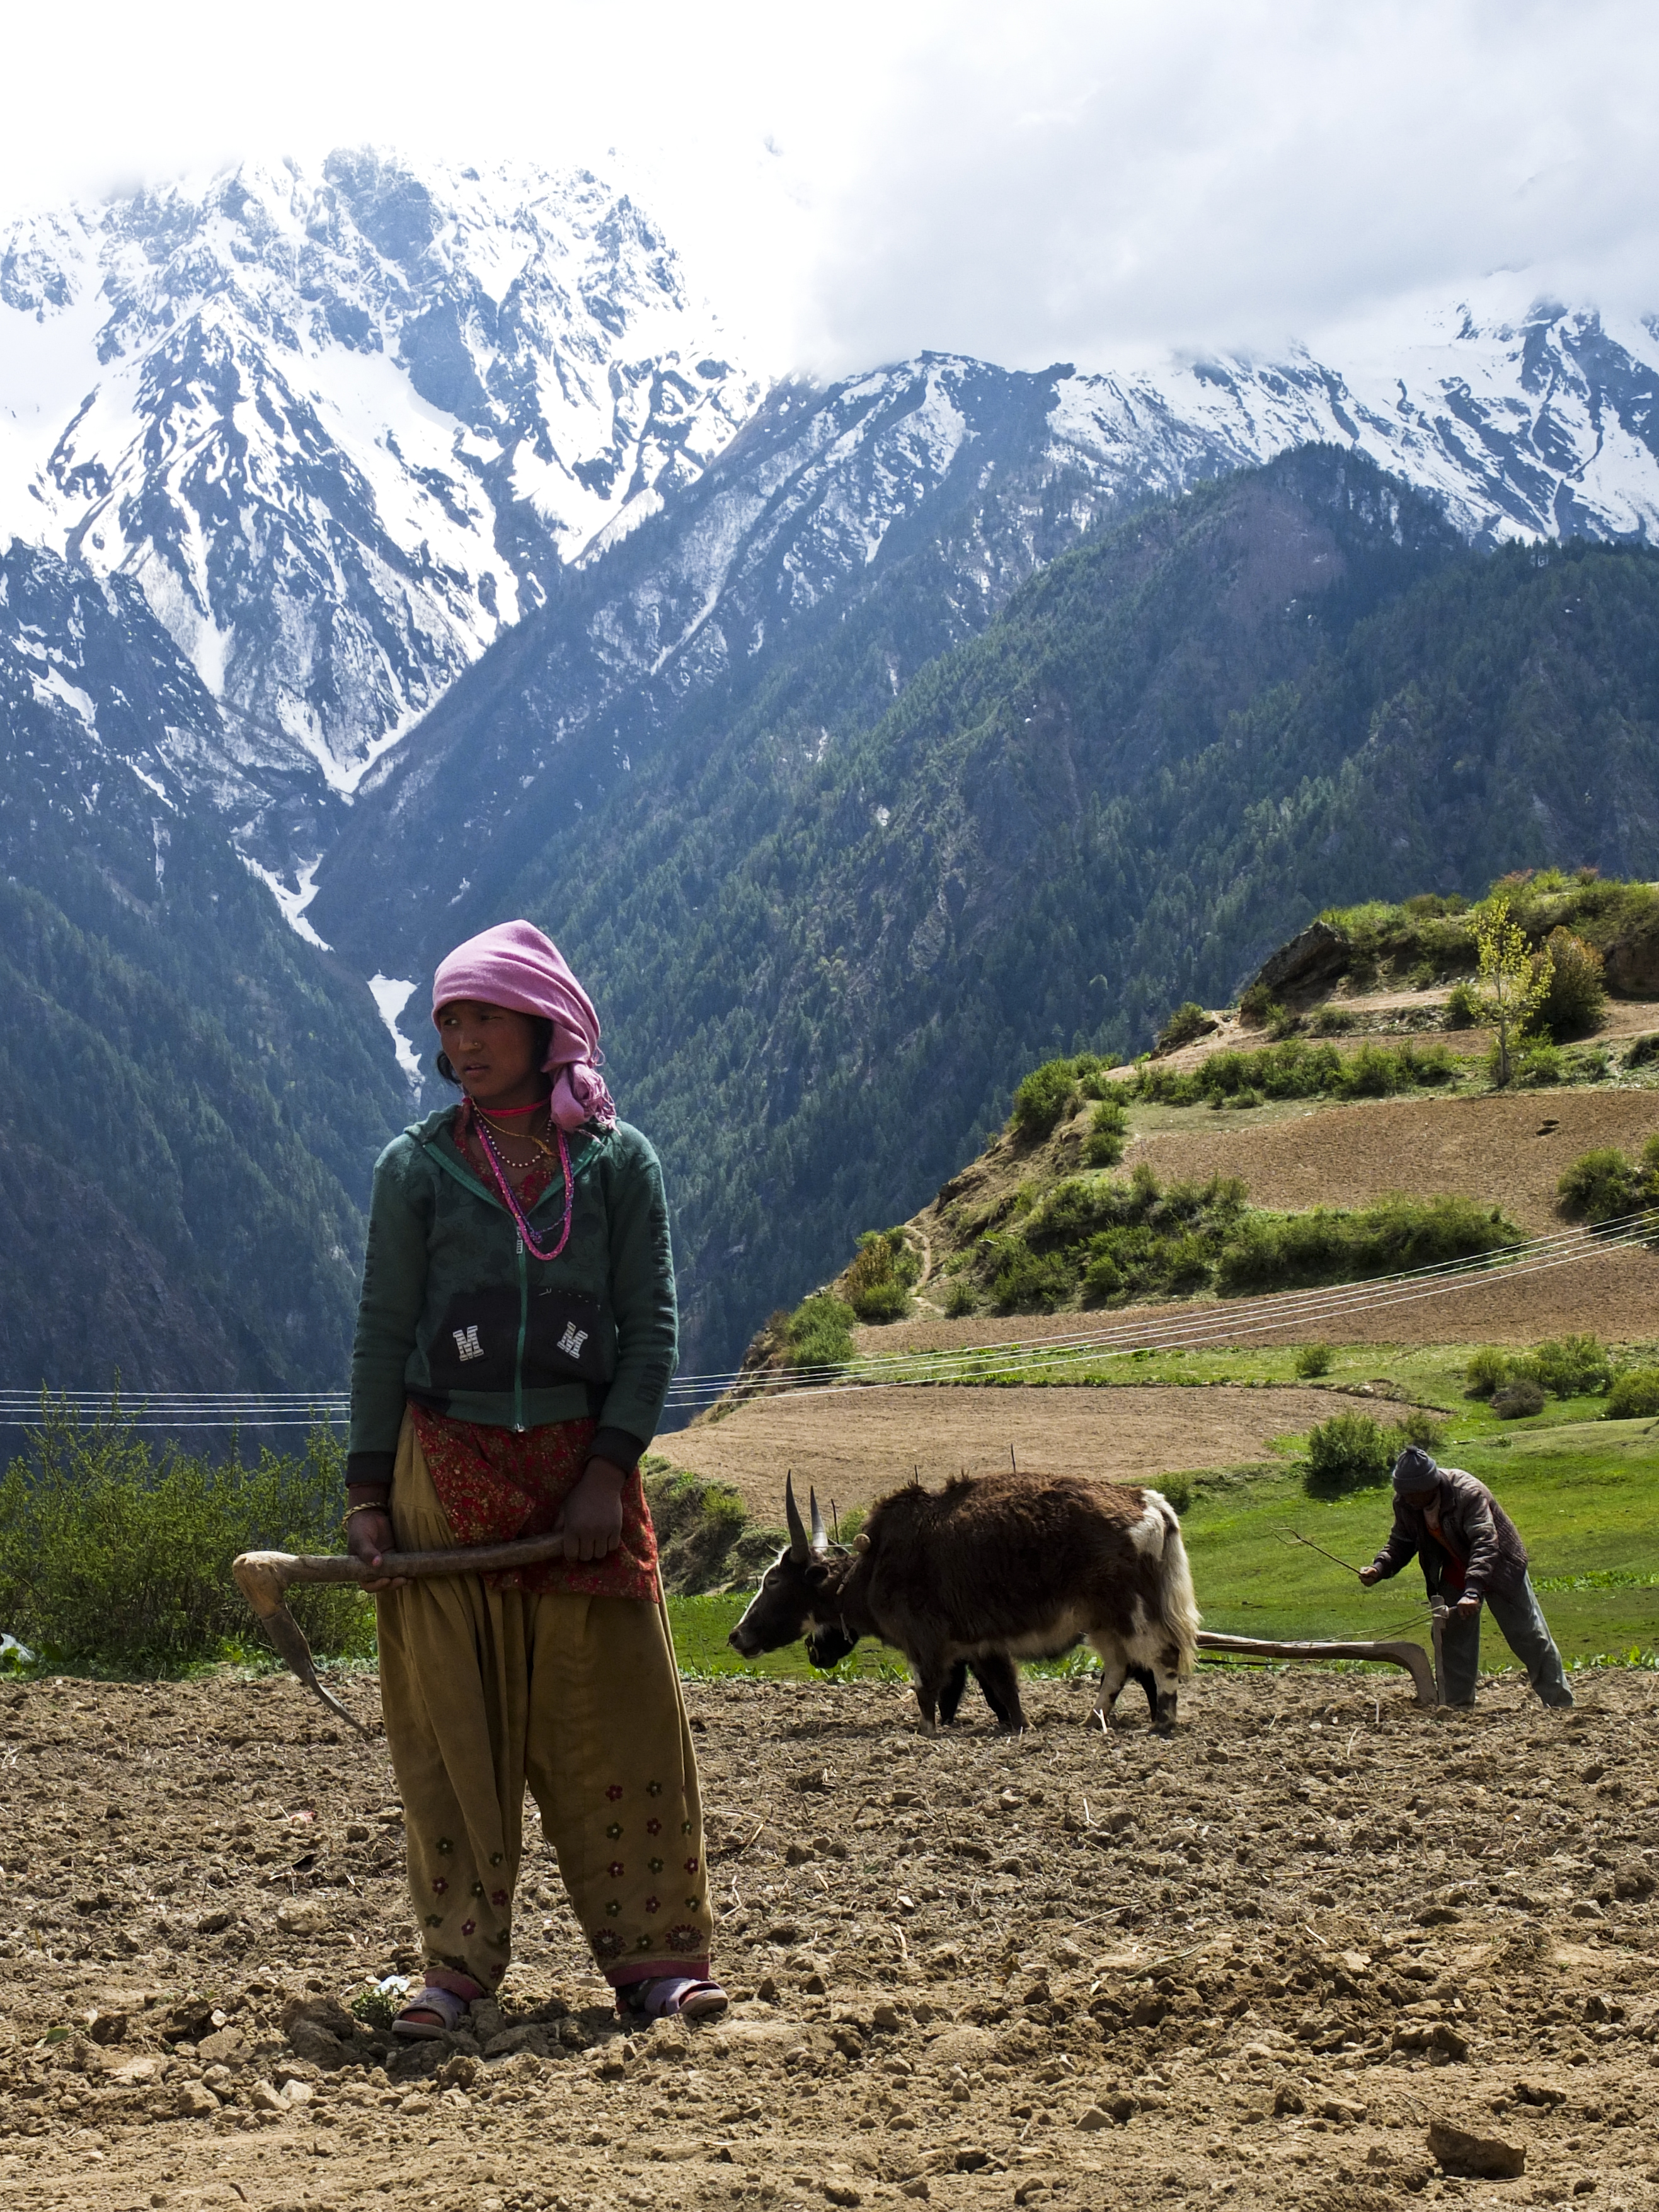 AGR-Nepal-Humla-2013-MA-009